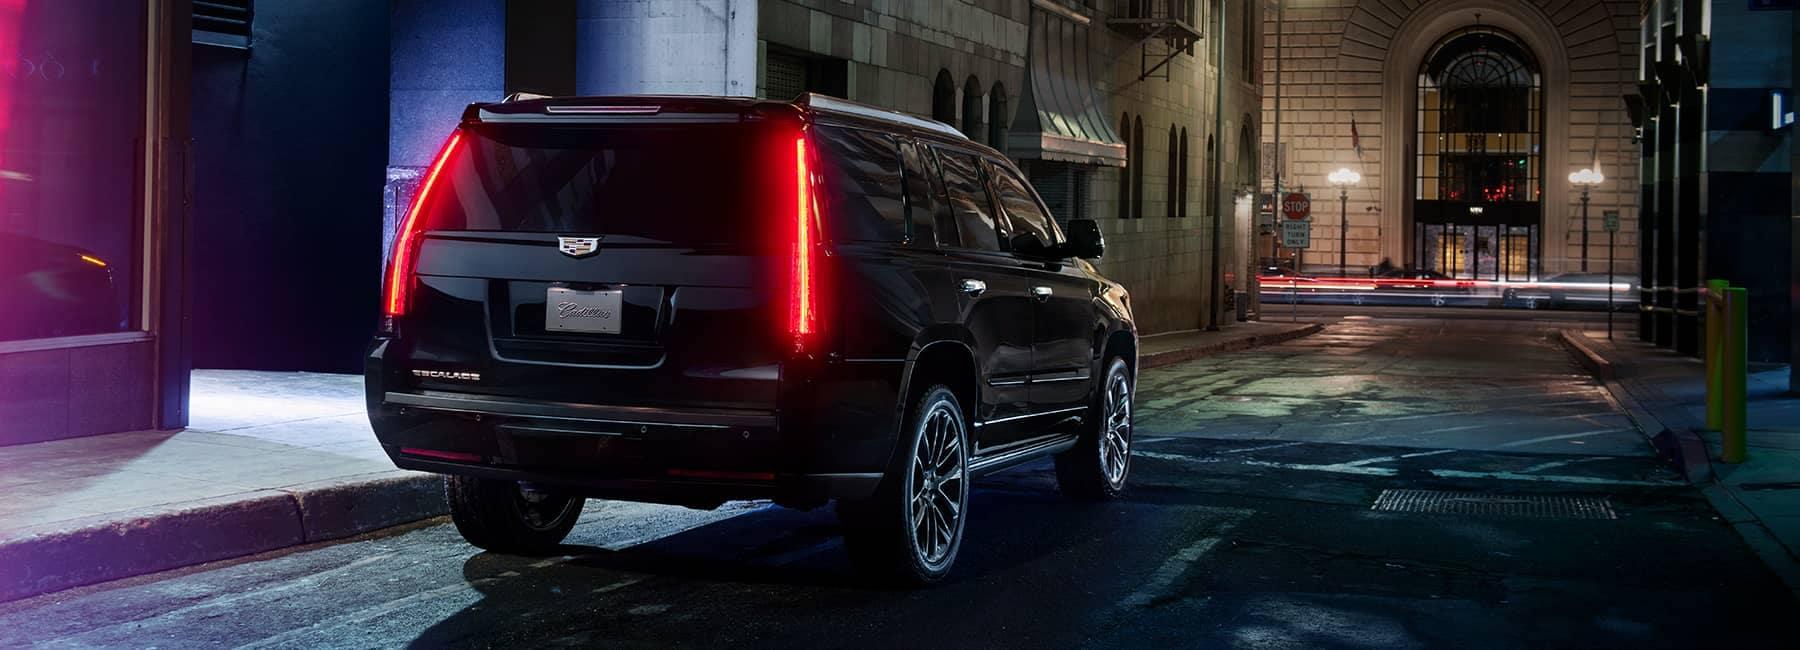 cadillac Black Cadillac Escalade parked in a city at night